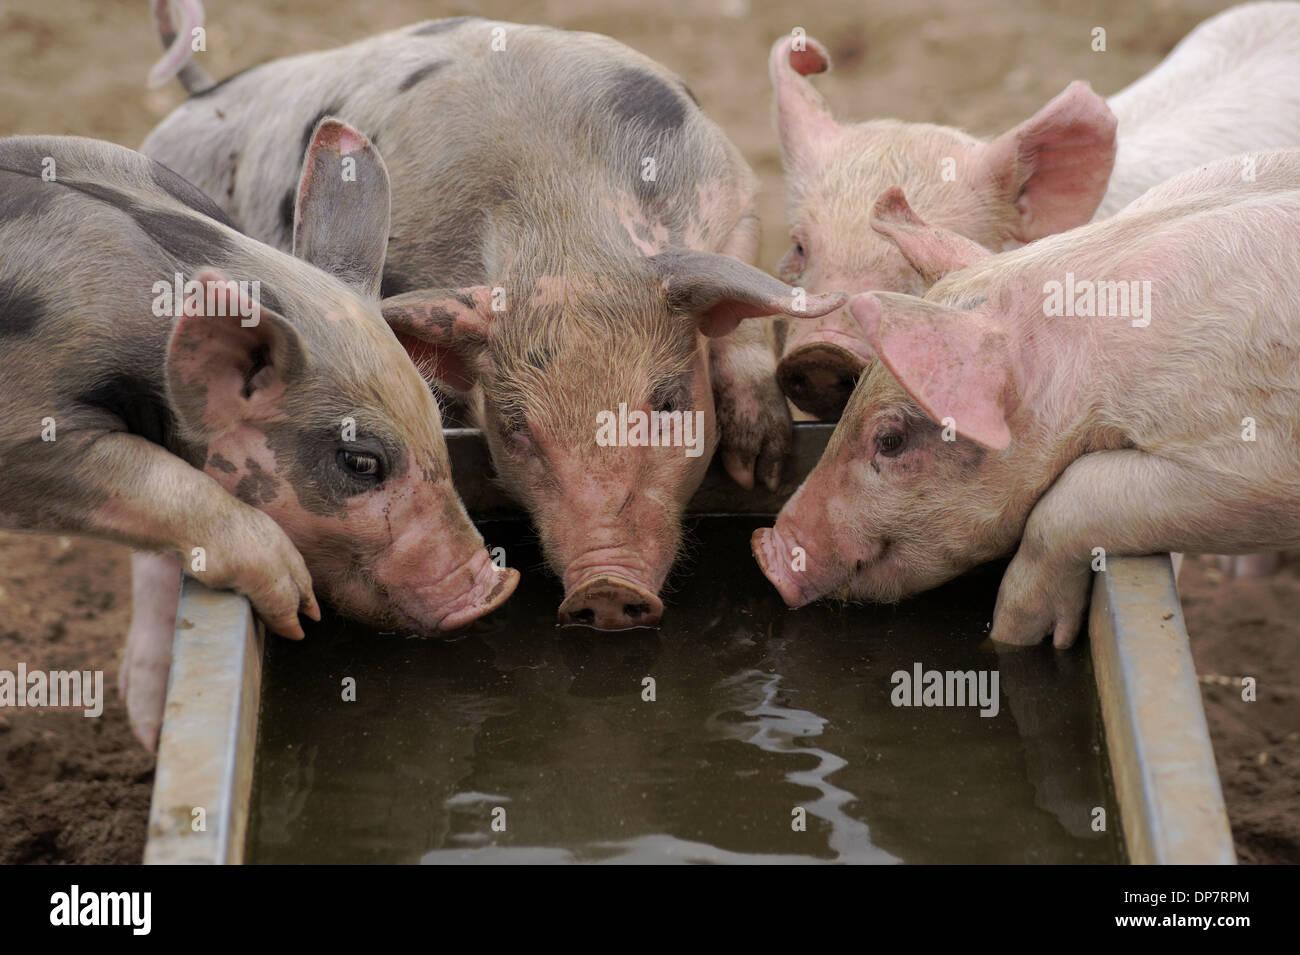 Domestic Pig Pietrain Crossbreed Four Piglets Drinking